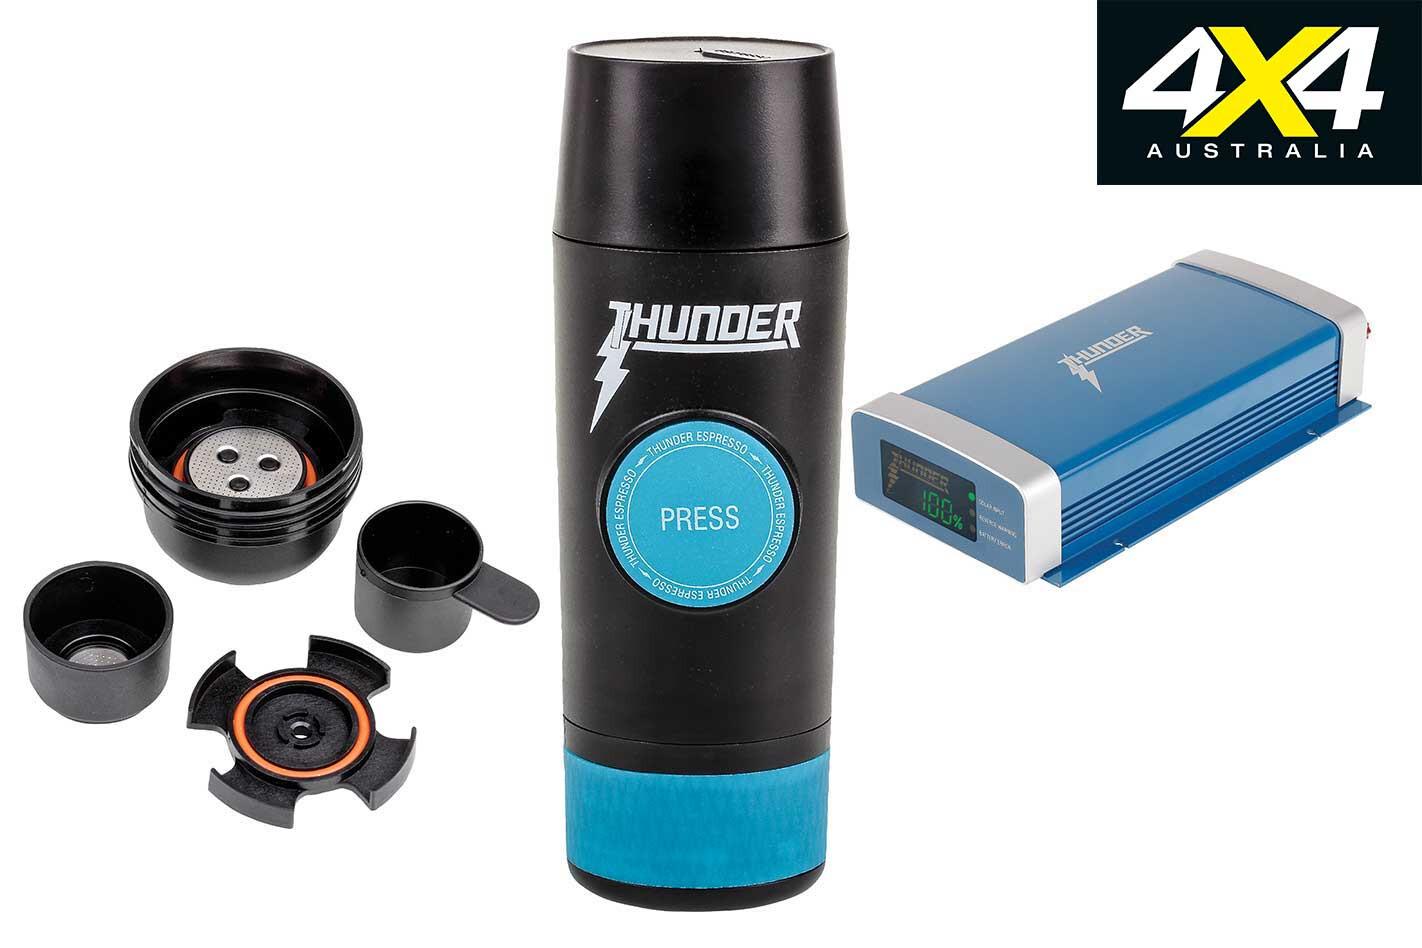 New 4 X 4 Gear Thunder Espresso Machine Jpg